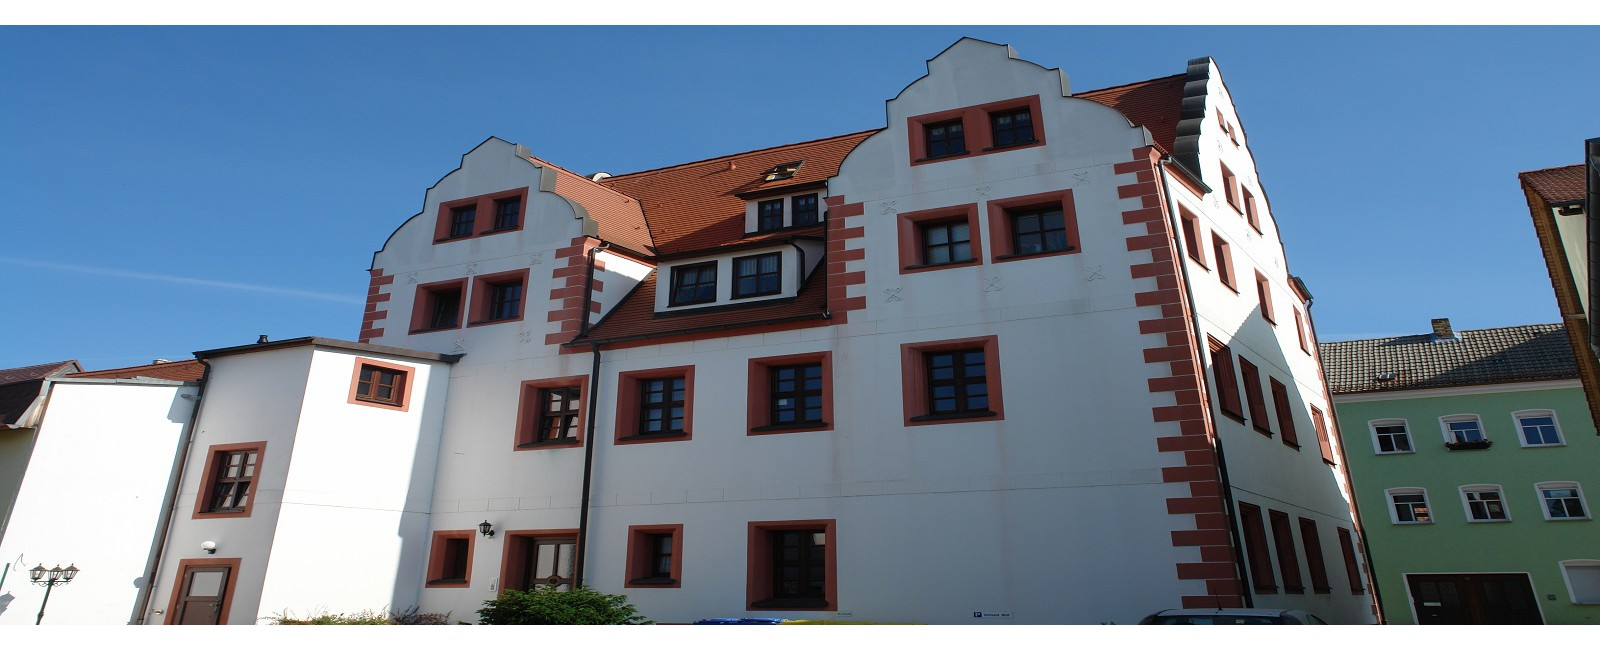 Ritterstraße27